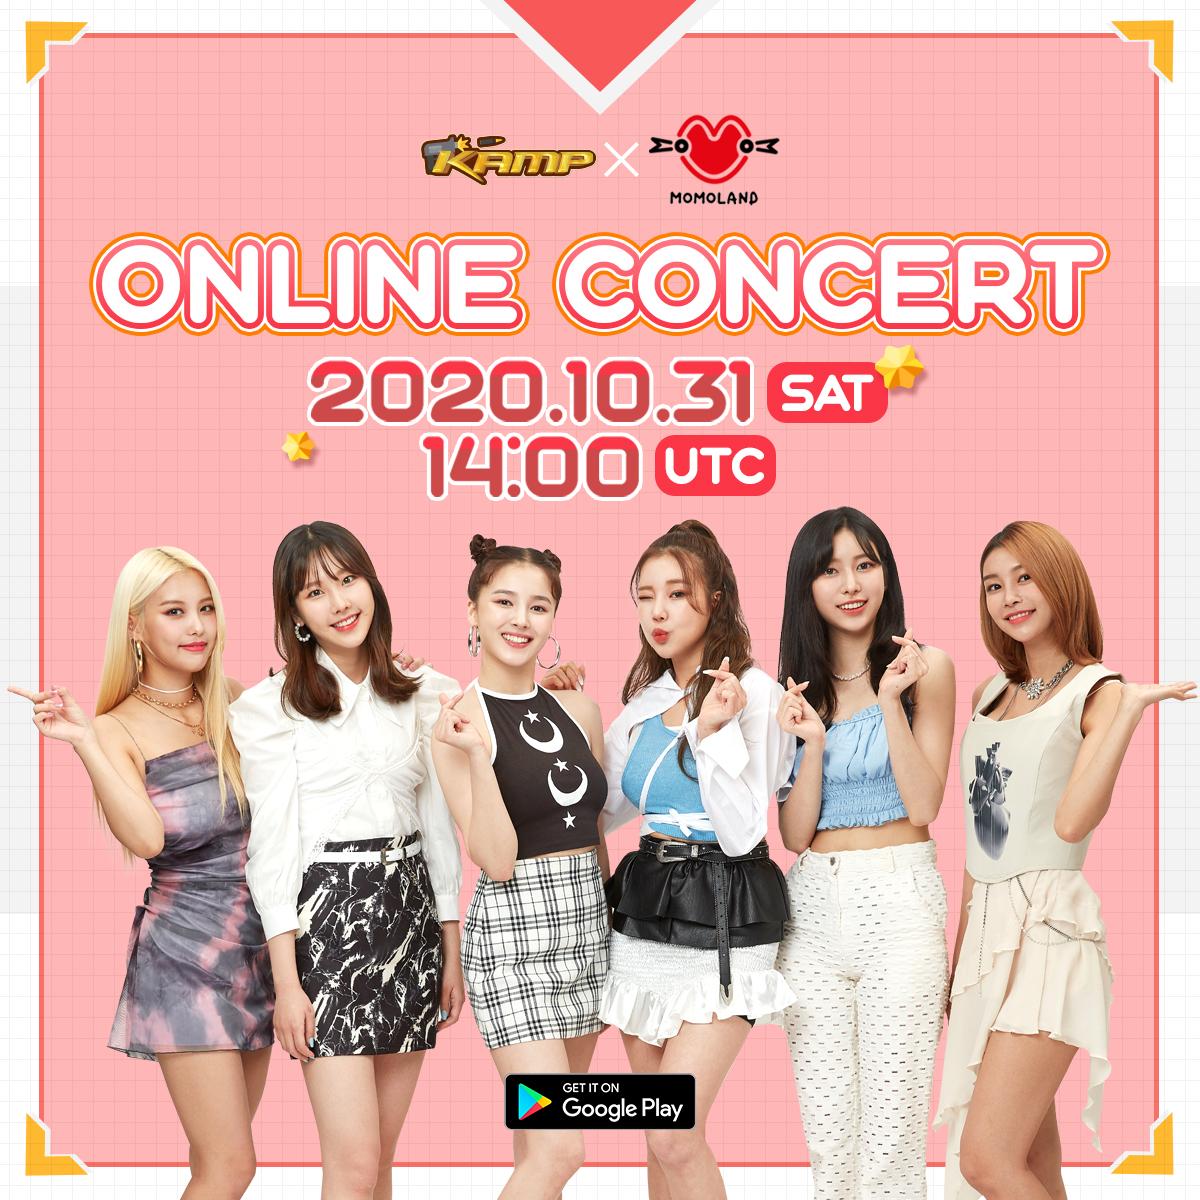 KAMP X MOMOLAND Online Concert 2020: Live Stream And ...